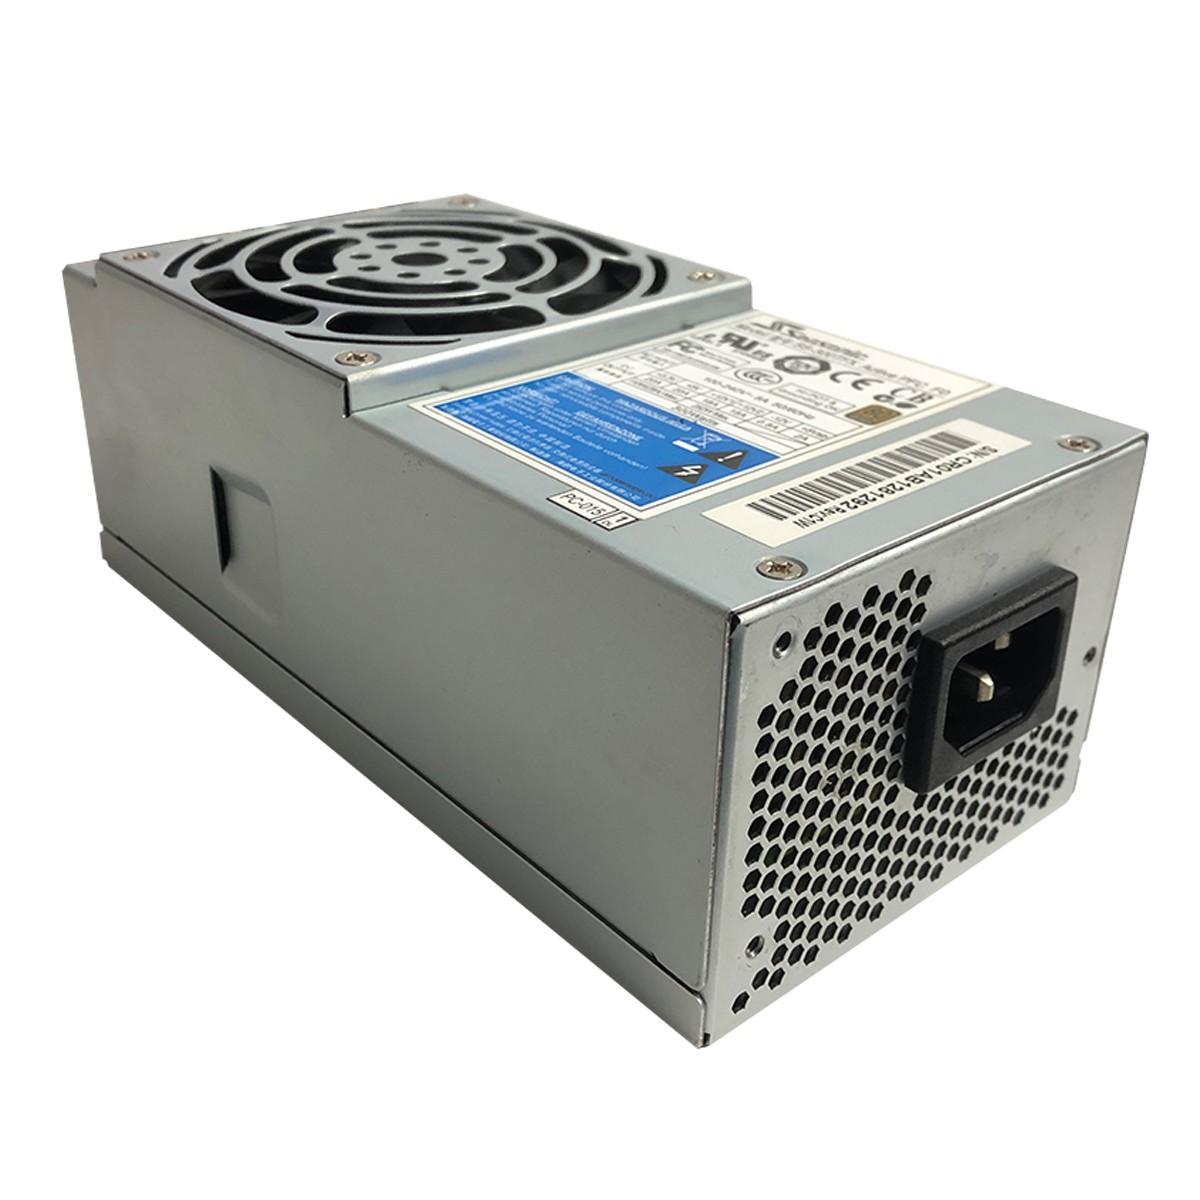 Fonte TFX Seasonic SS-300TFX 300W 80 Plus Bronze, PFC Ativo, Slim, Bivolt Automático